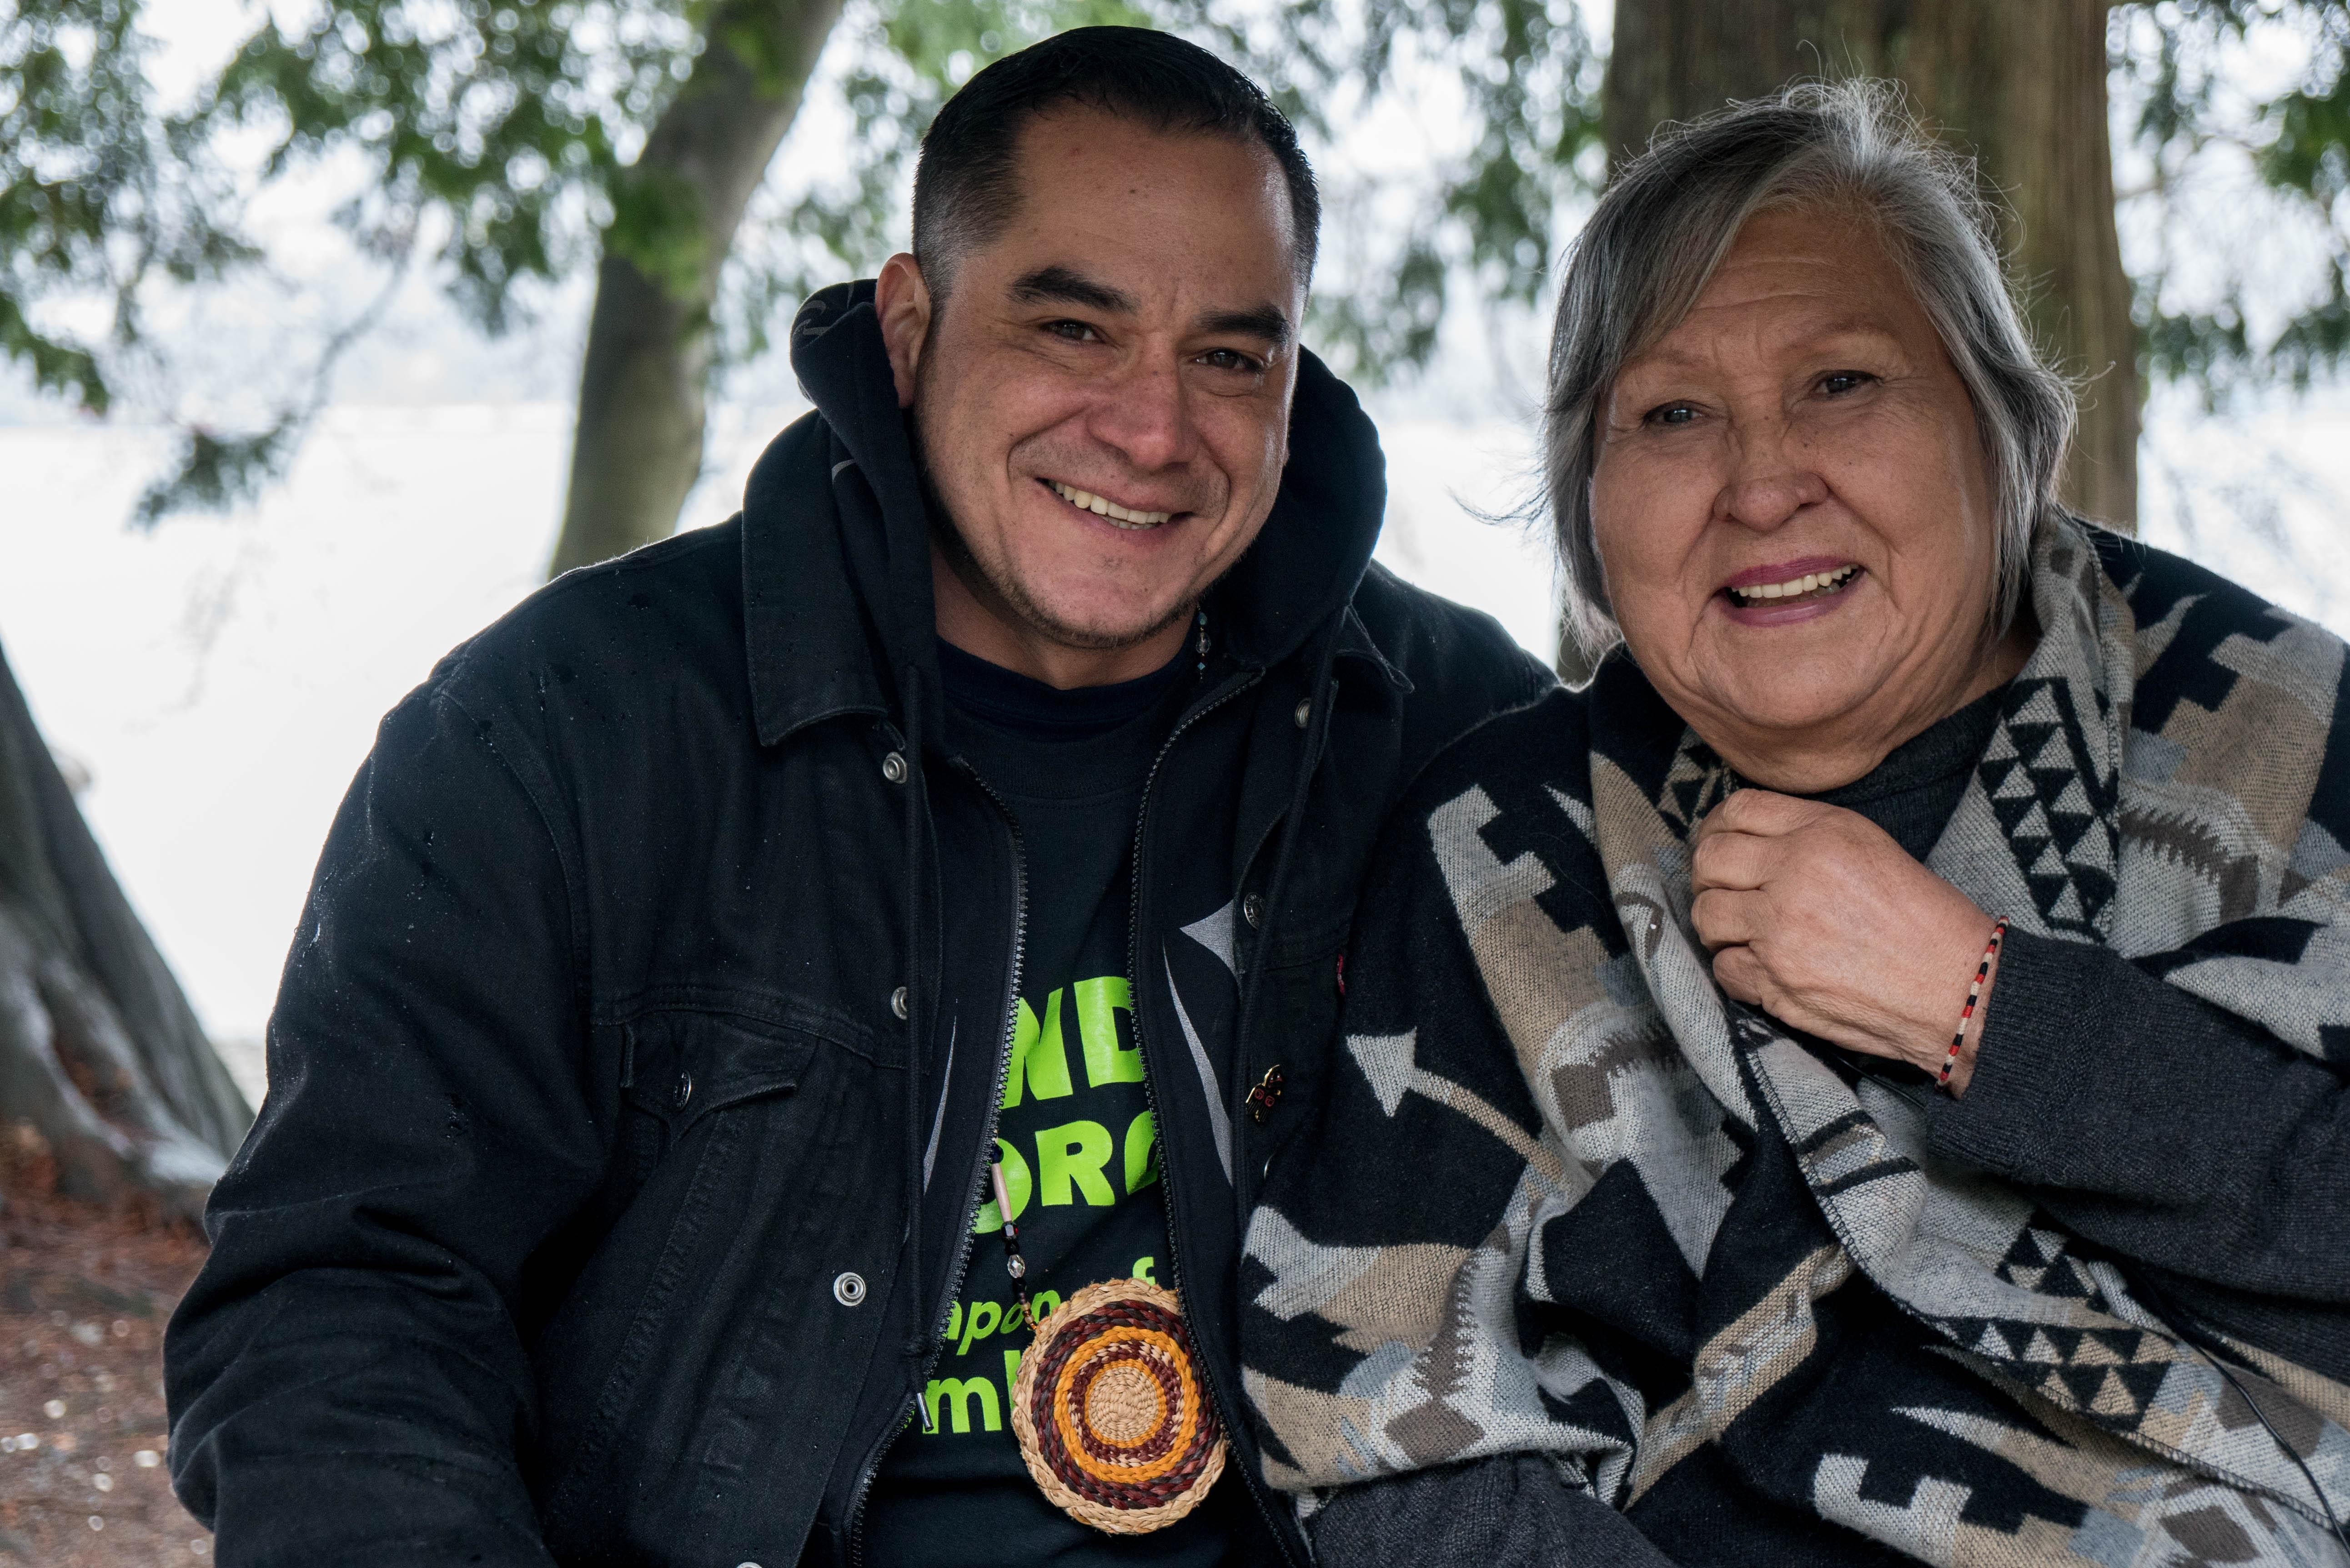 Michael George and Ta'ah Amy George, Indigenous leaders. © Alex Harris